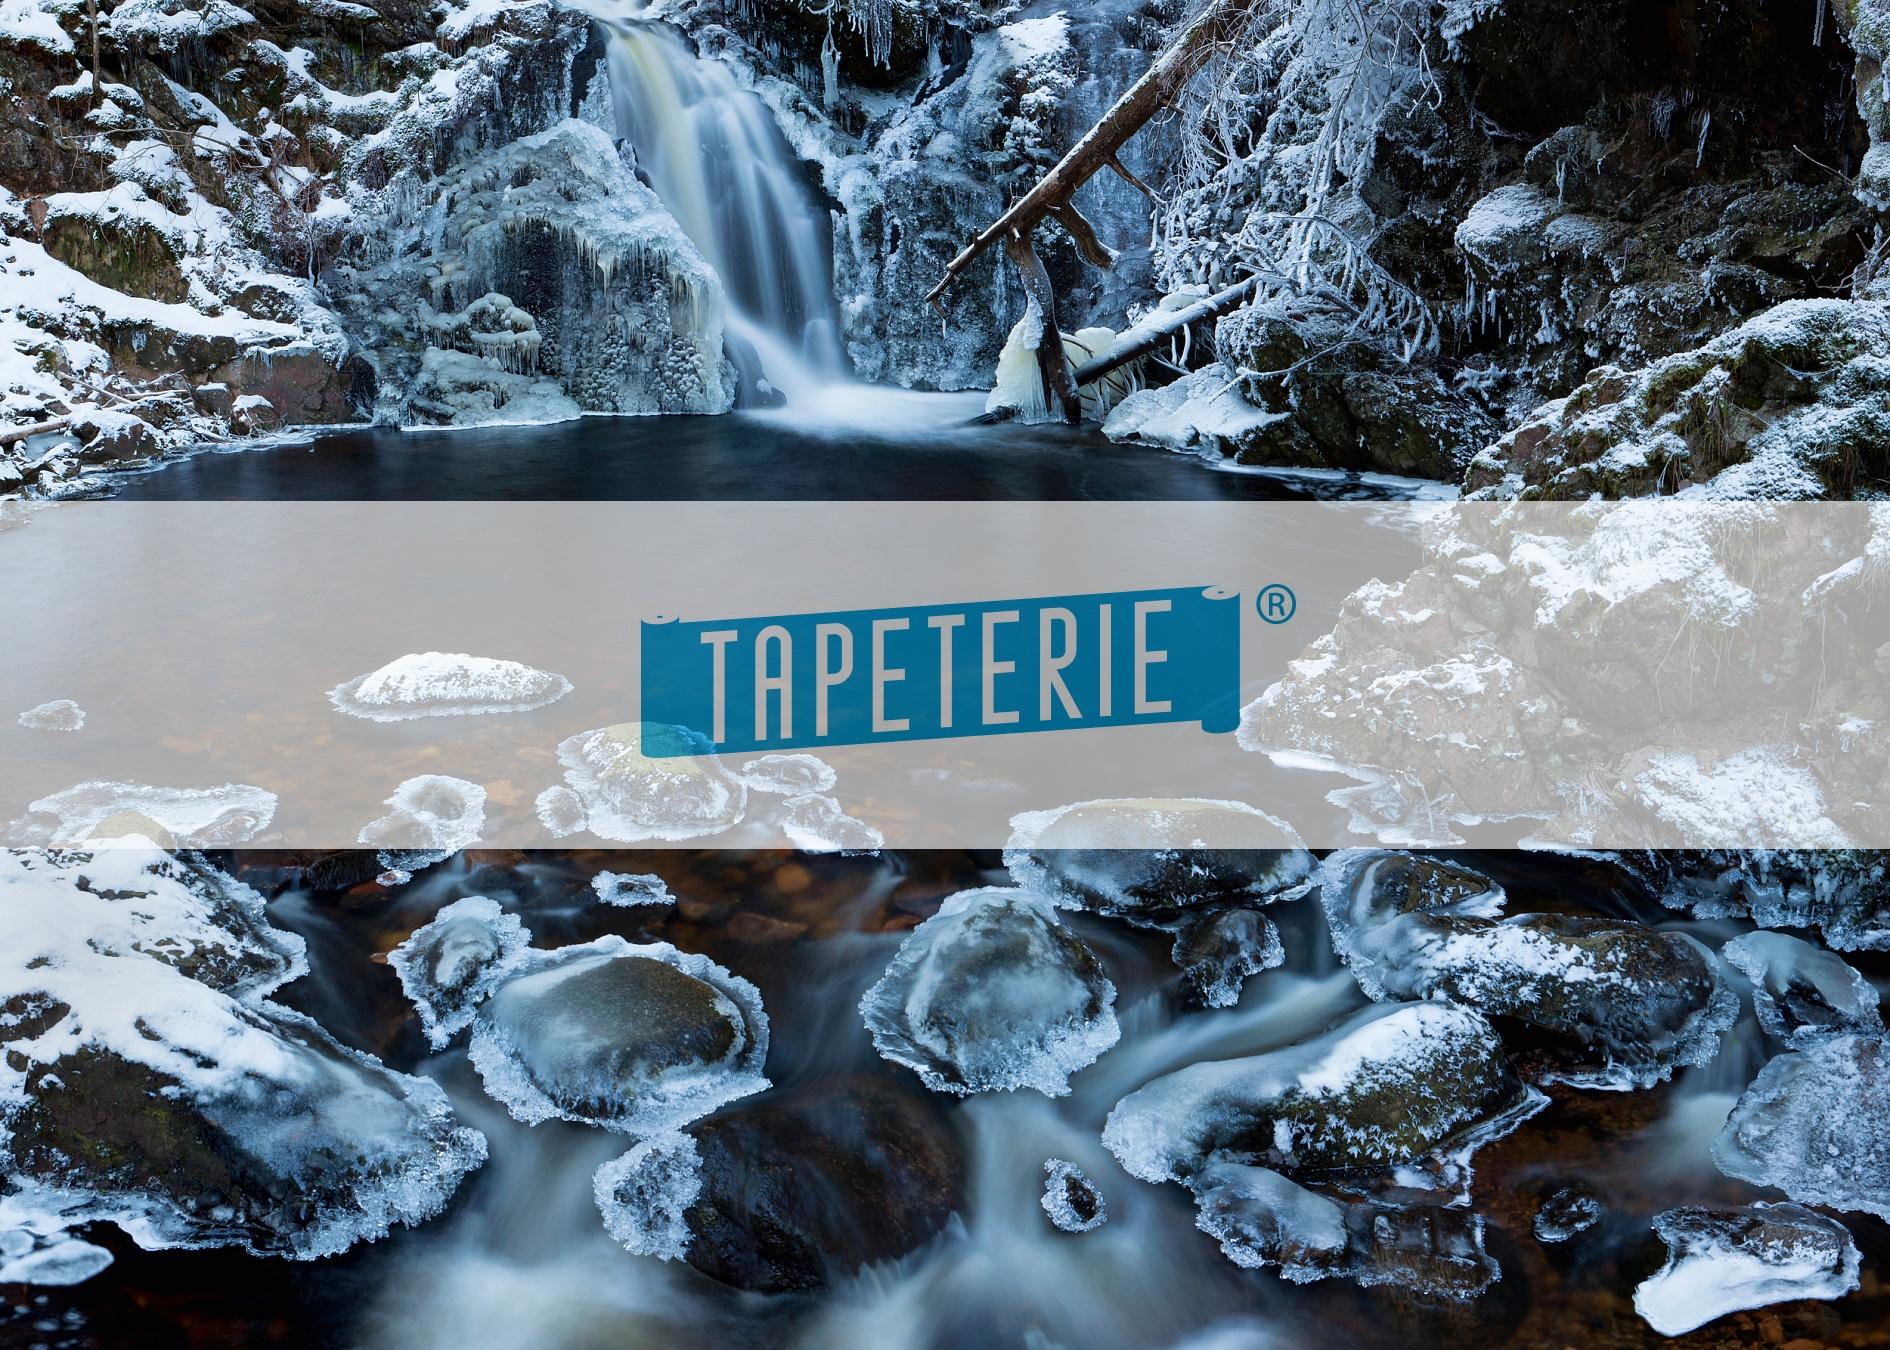 Fototapeten Winterlandschaft : Fototapete Eisiger Wasserfall im Schwarzwald Tapeterie